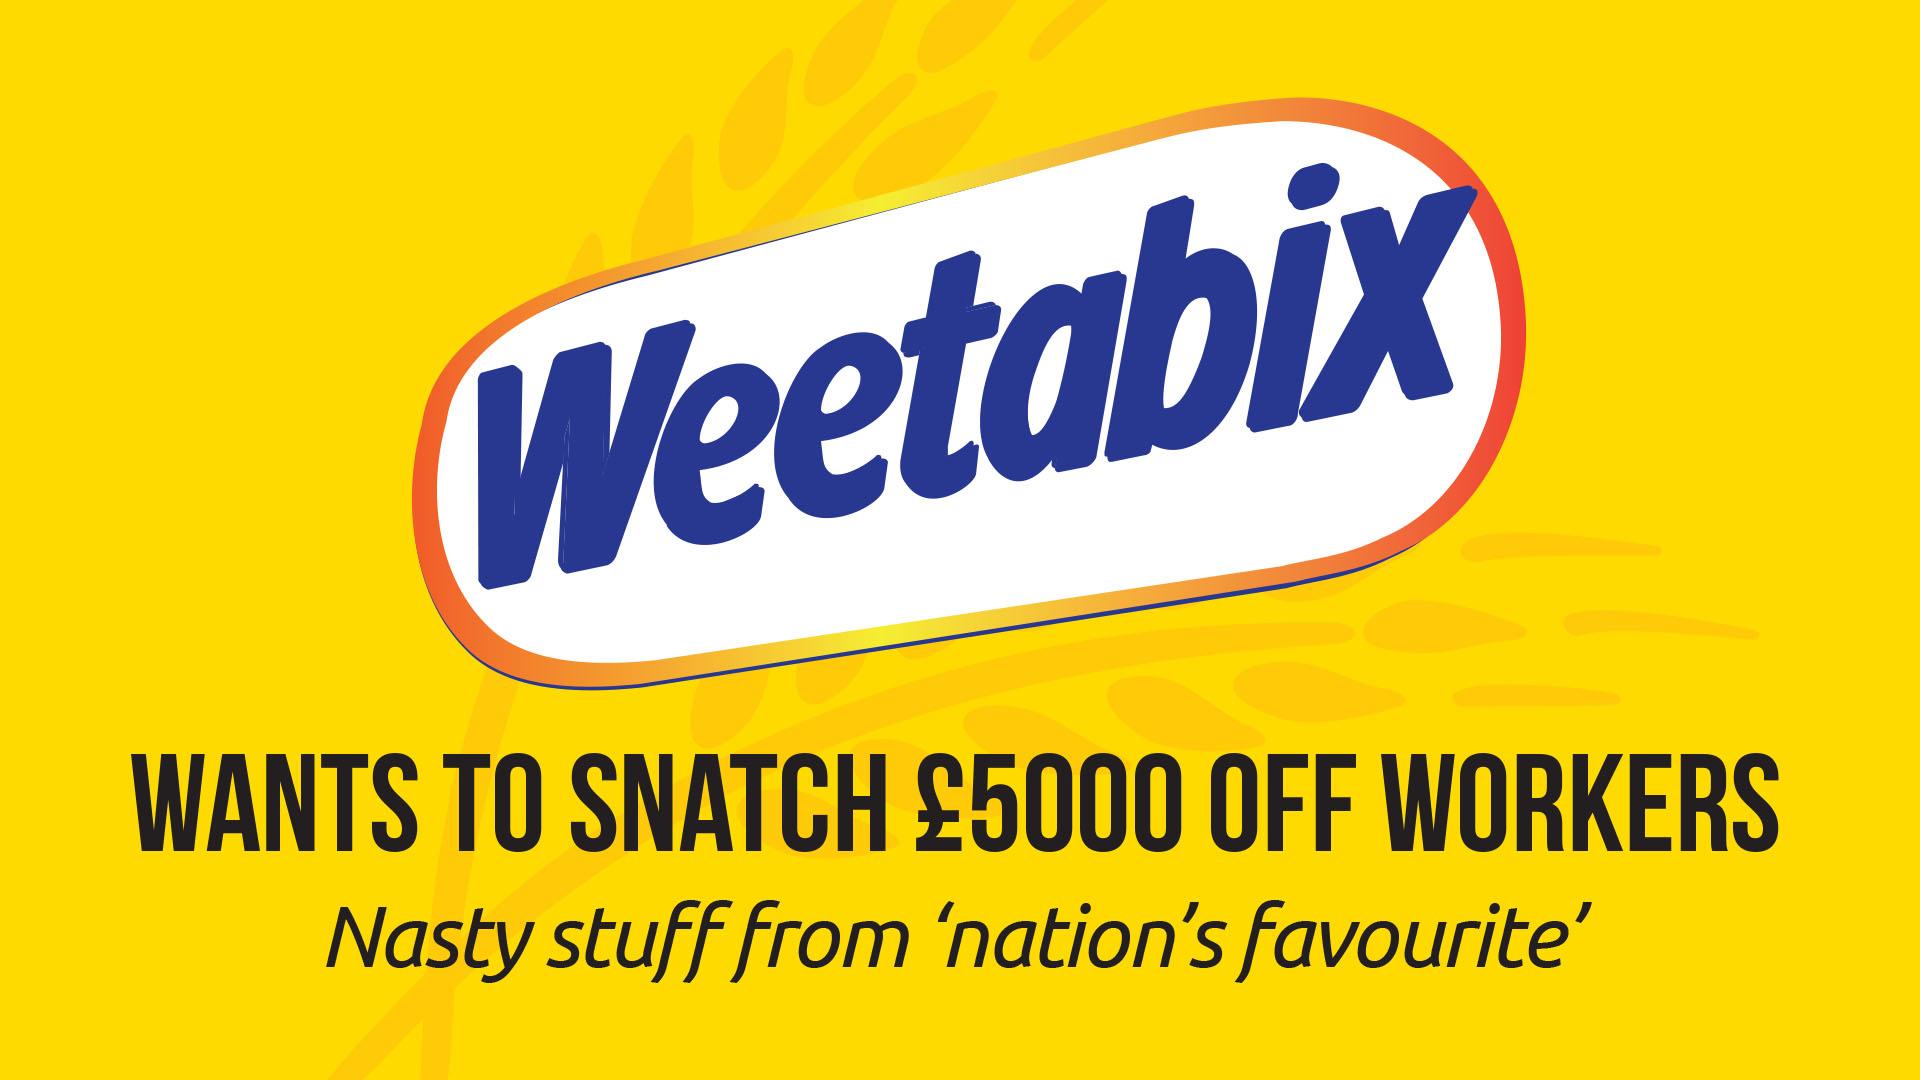 Weetabix Twitter